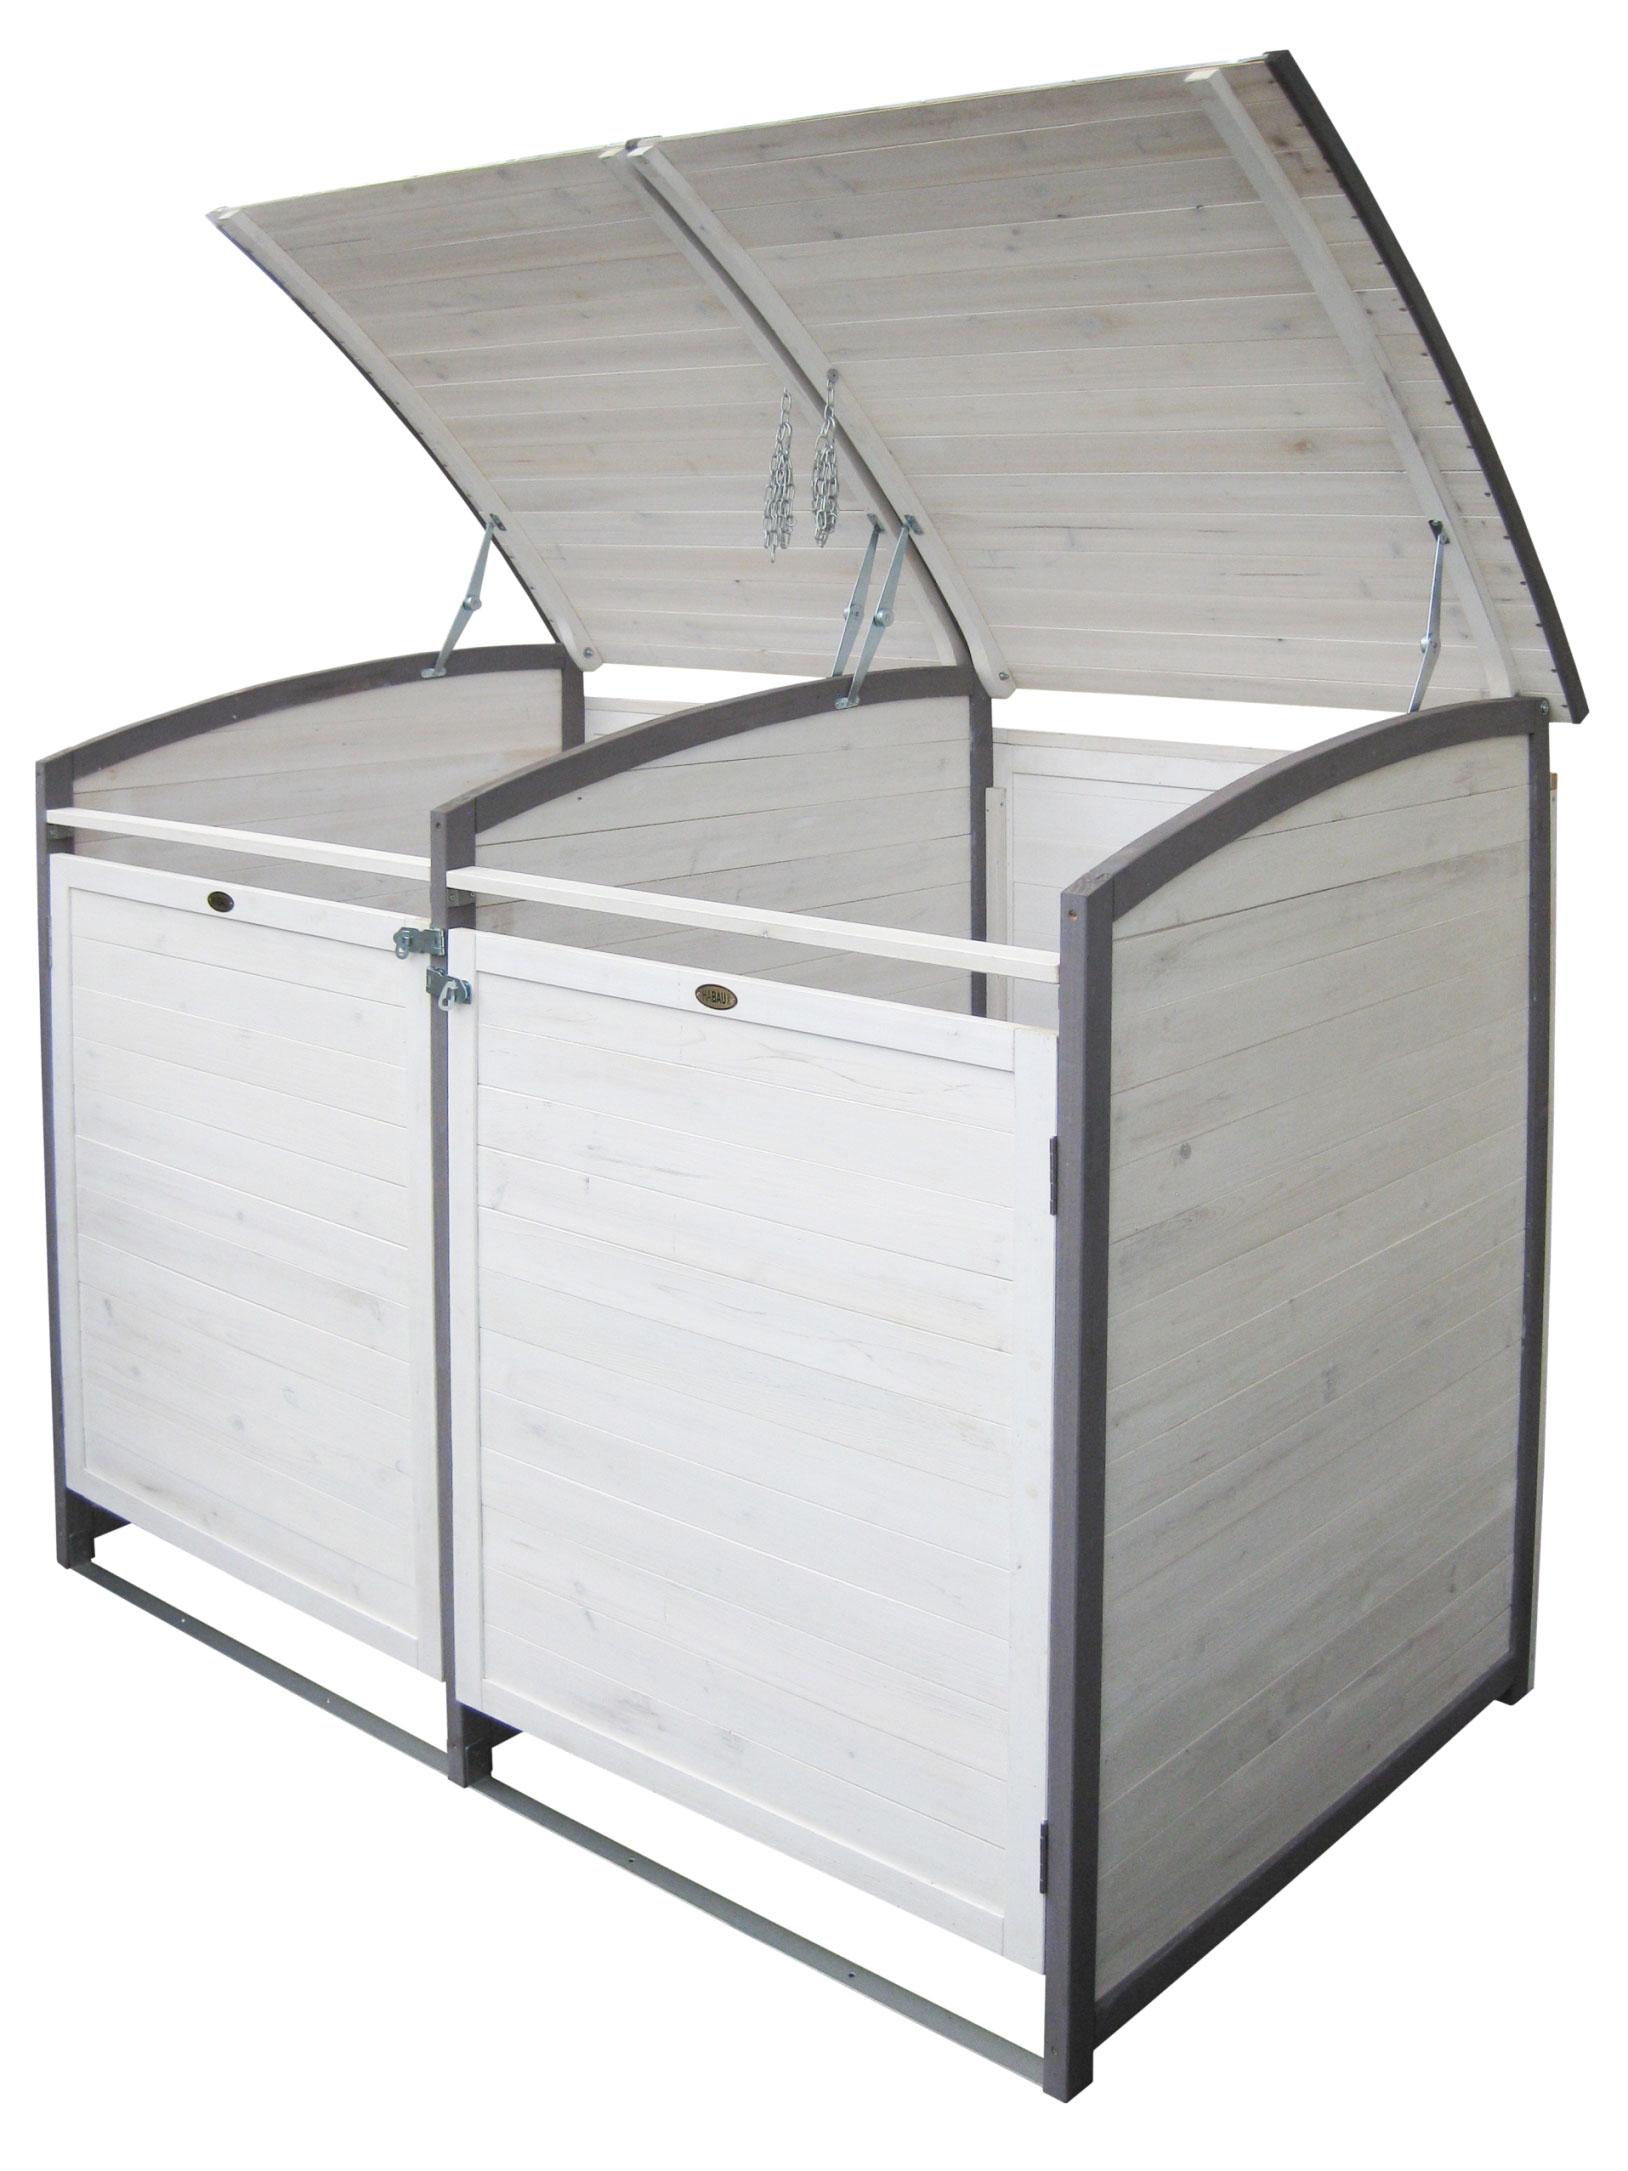 Mülltonnenbox Habau 120 L Doppel weiss / grau Holz ca. 122x76x116cm Bild 2